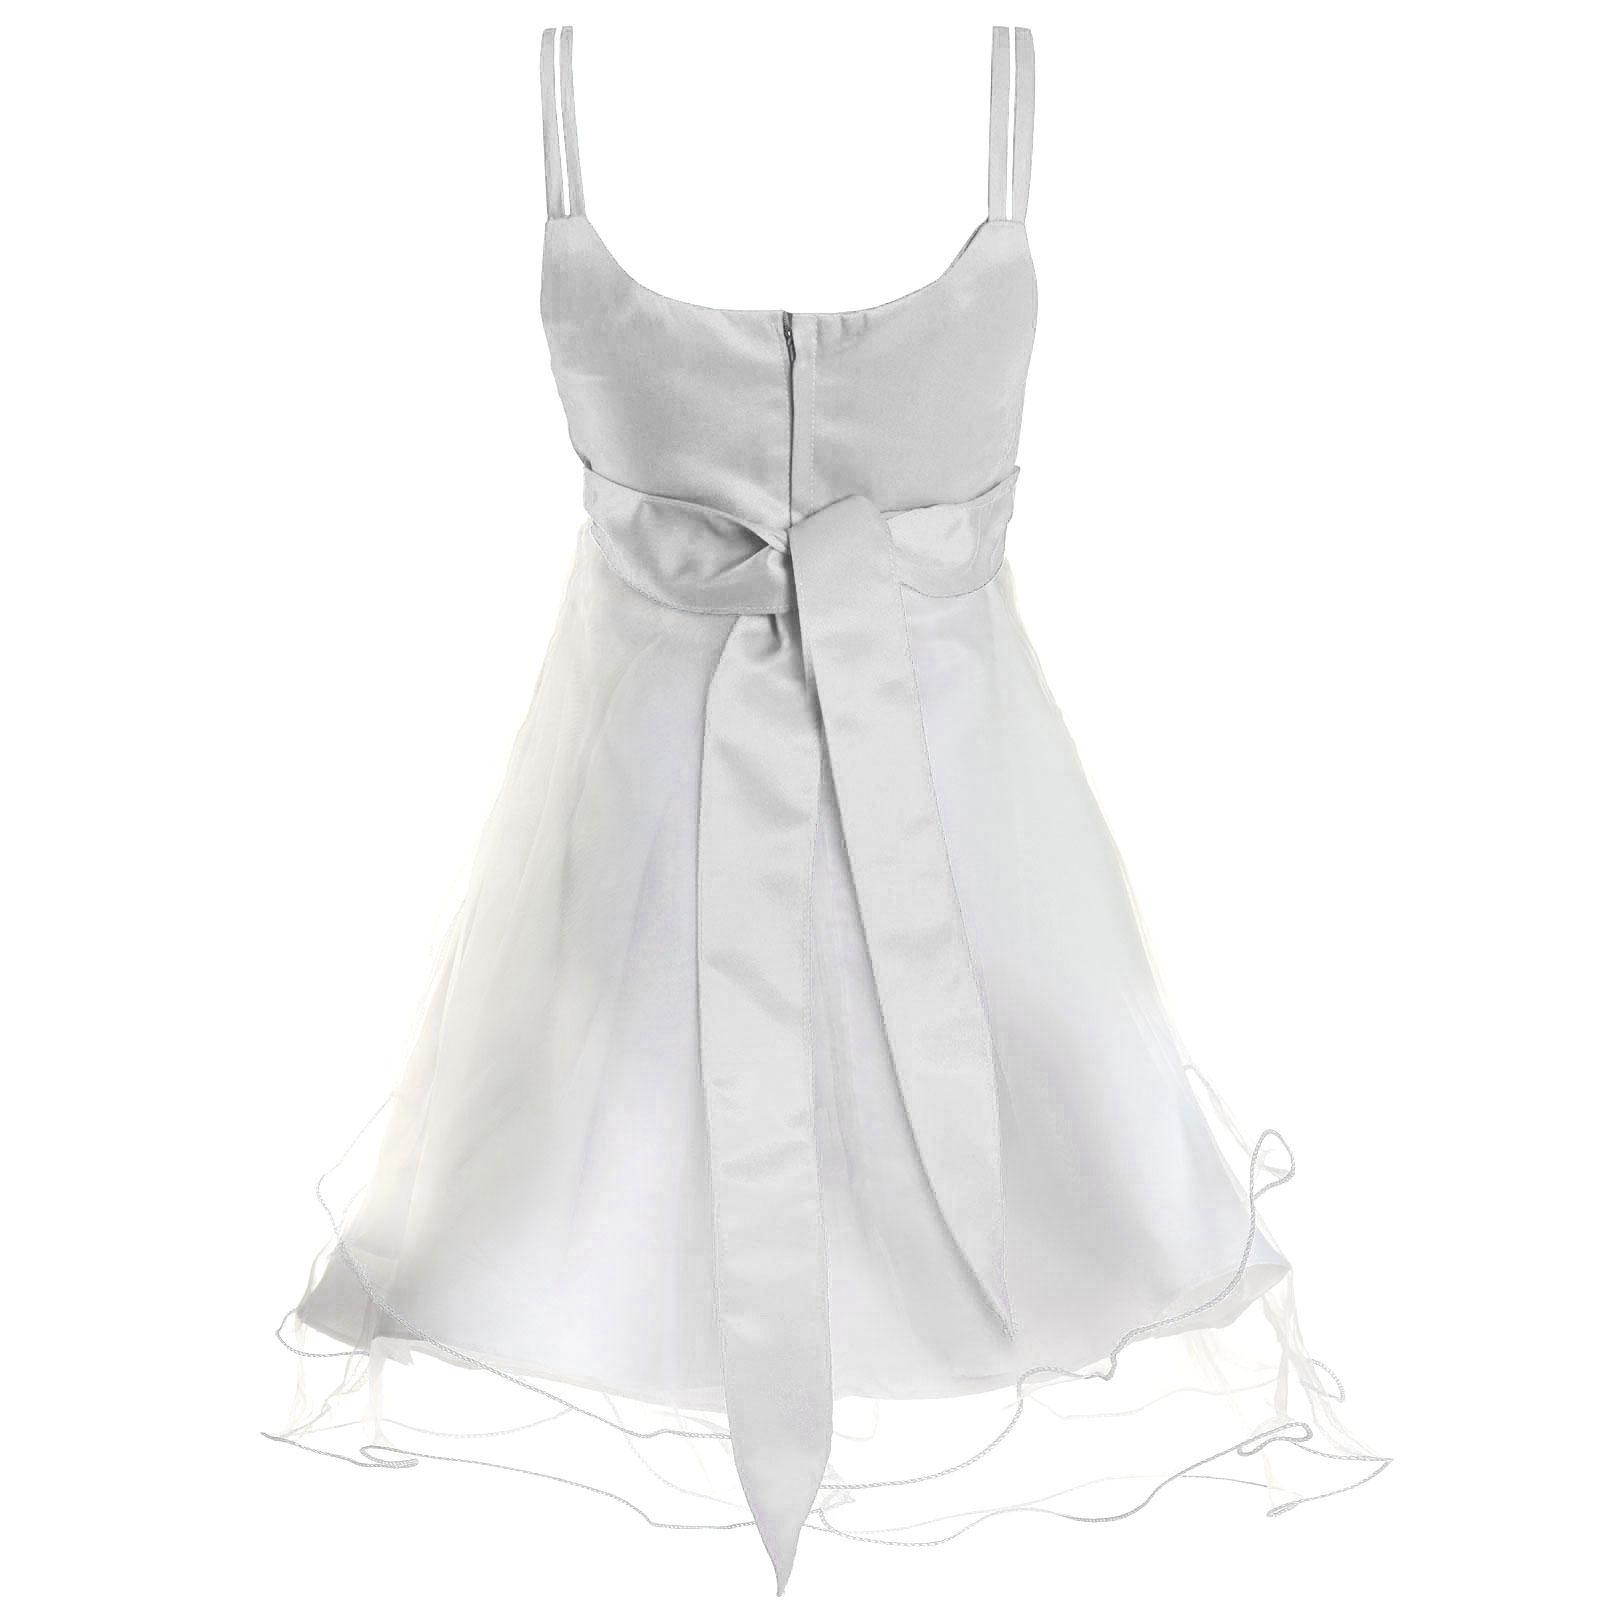 Maedchen-Kinder-Kleid-Peticoat-Festkleid-Lang-Arm-Kostuem-mit-Bolero-Rose-21476 Indexbild 25